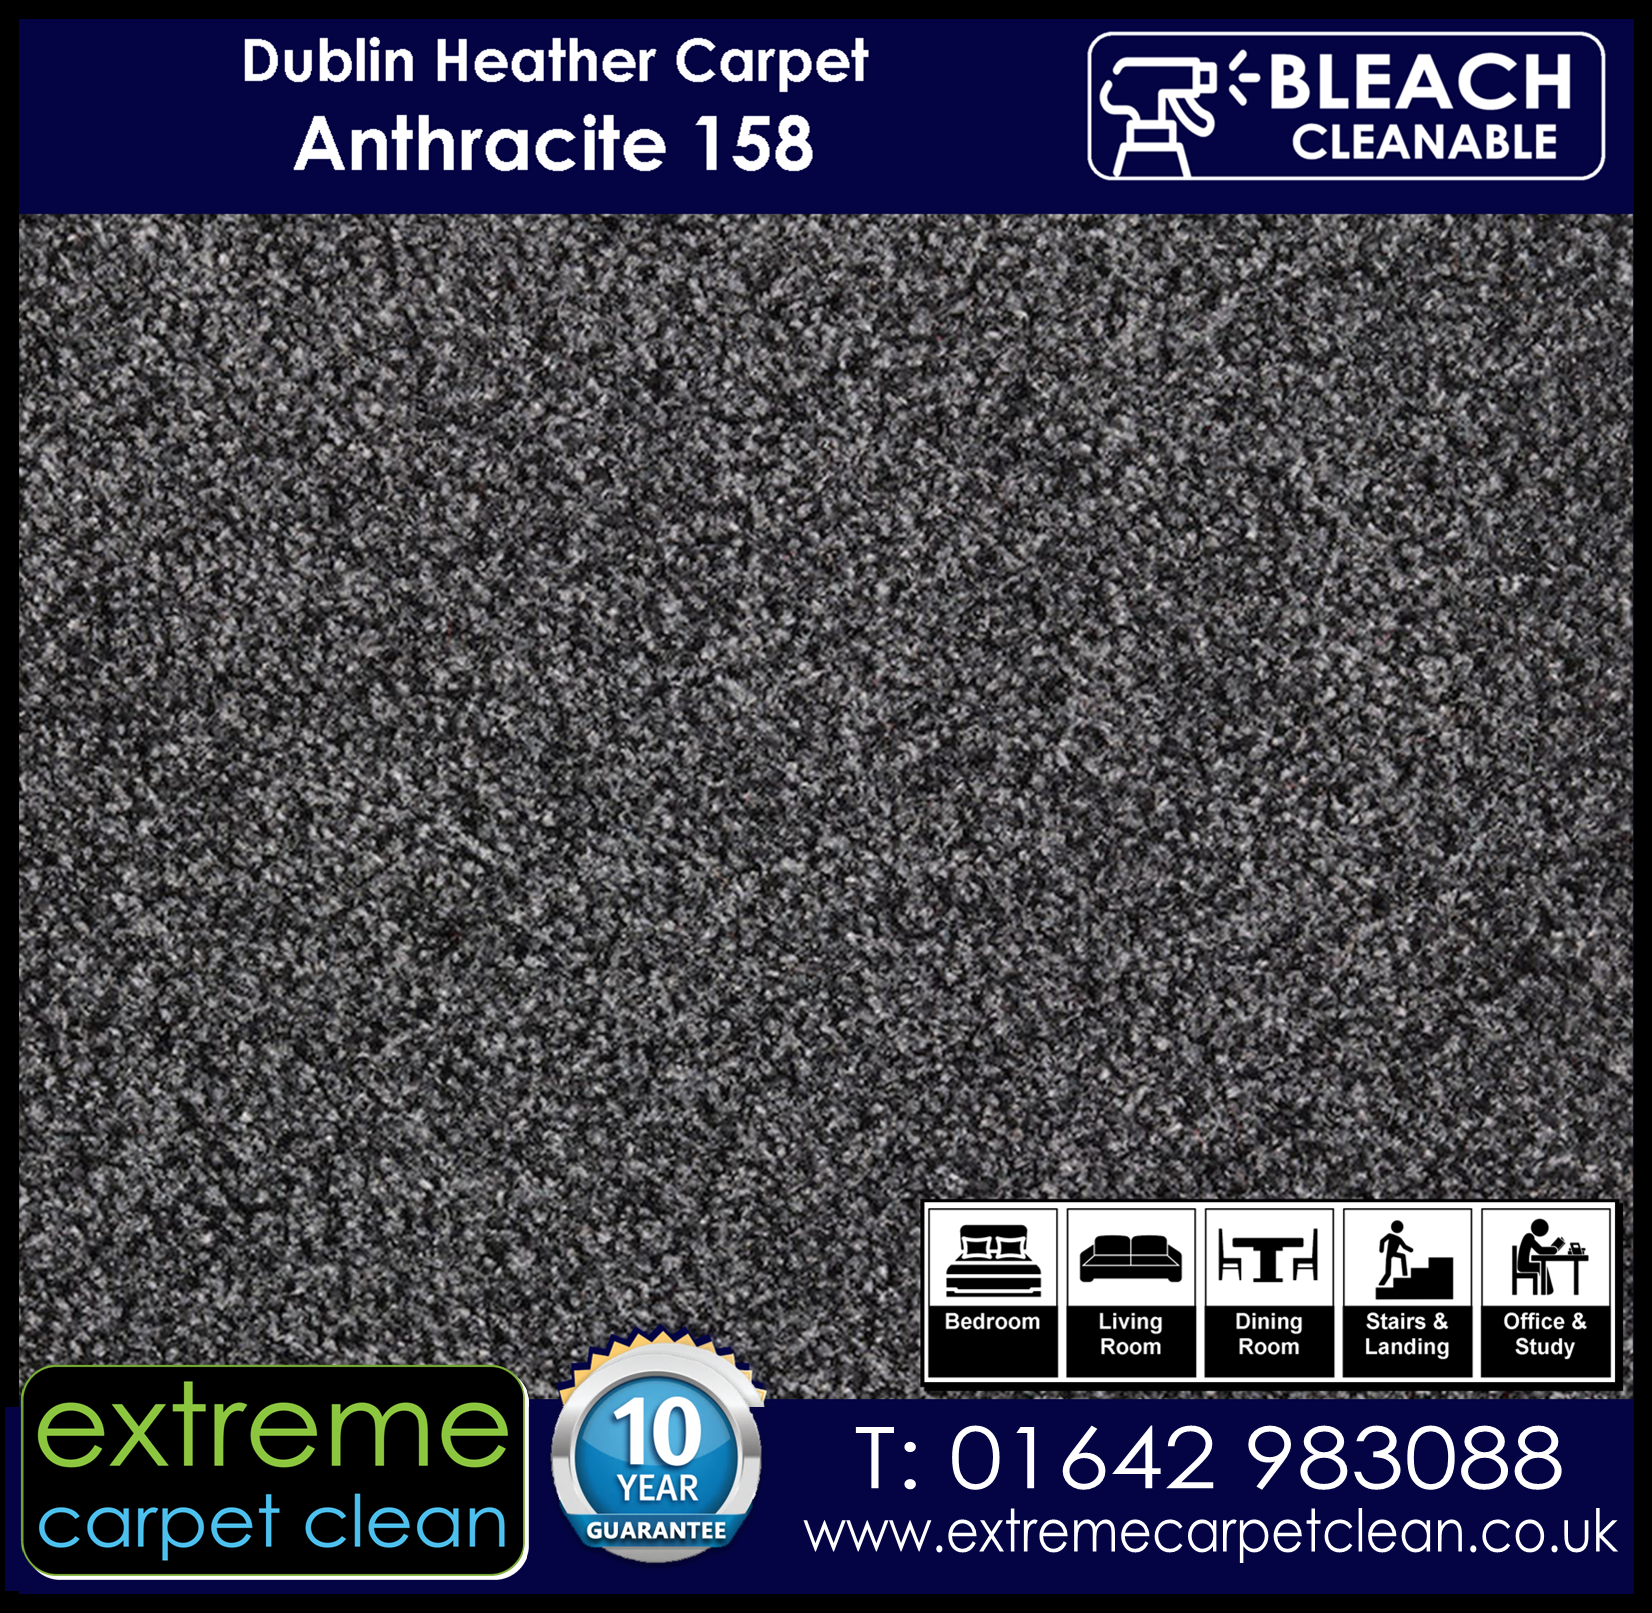 Extreme Carpet Clean Dublin Heather Carpet . Anthracite 158